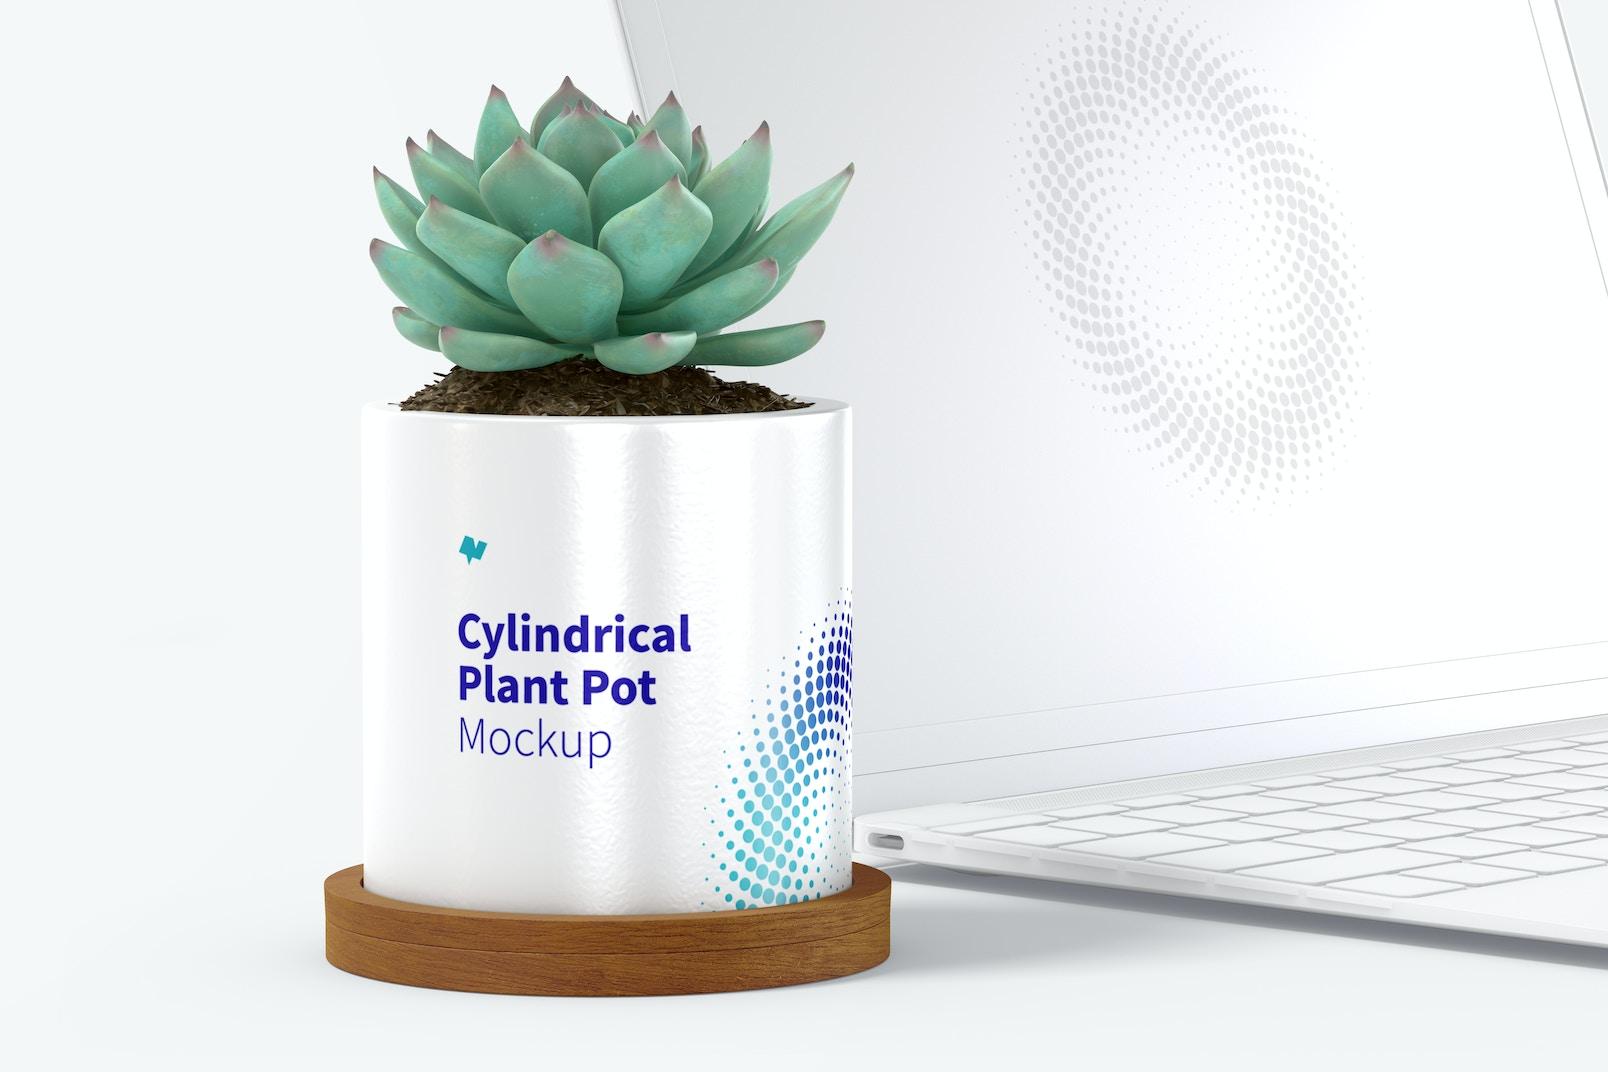 Ceramic Cylindrical Plant Pot and Laptop Mockup